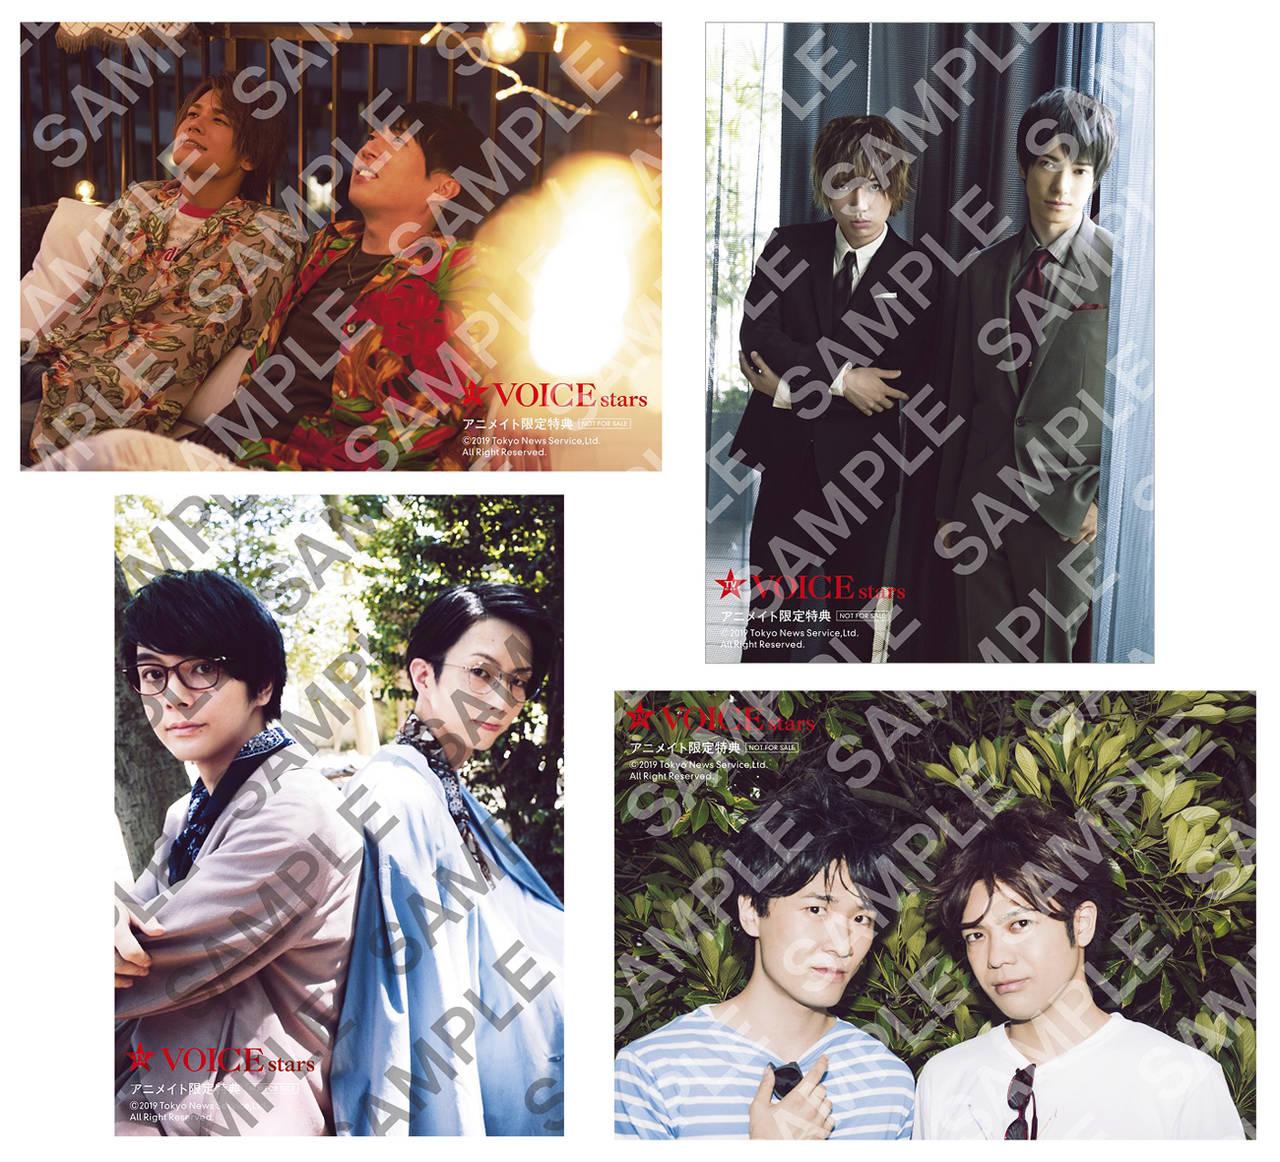 TVガイドVOICE STARS vol.11  1